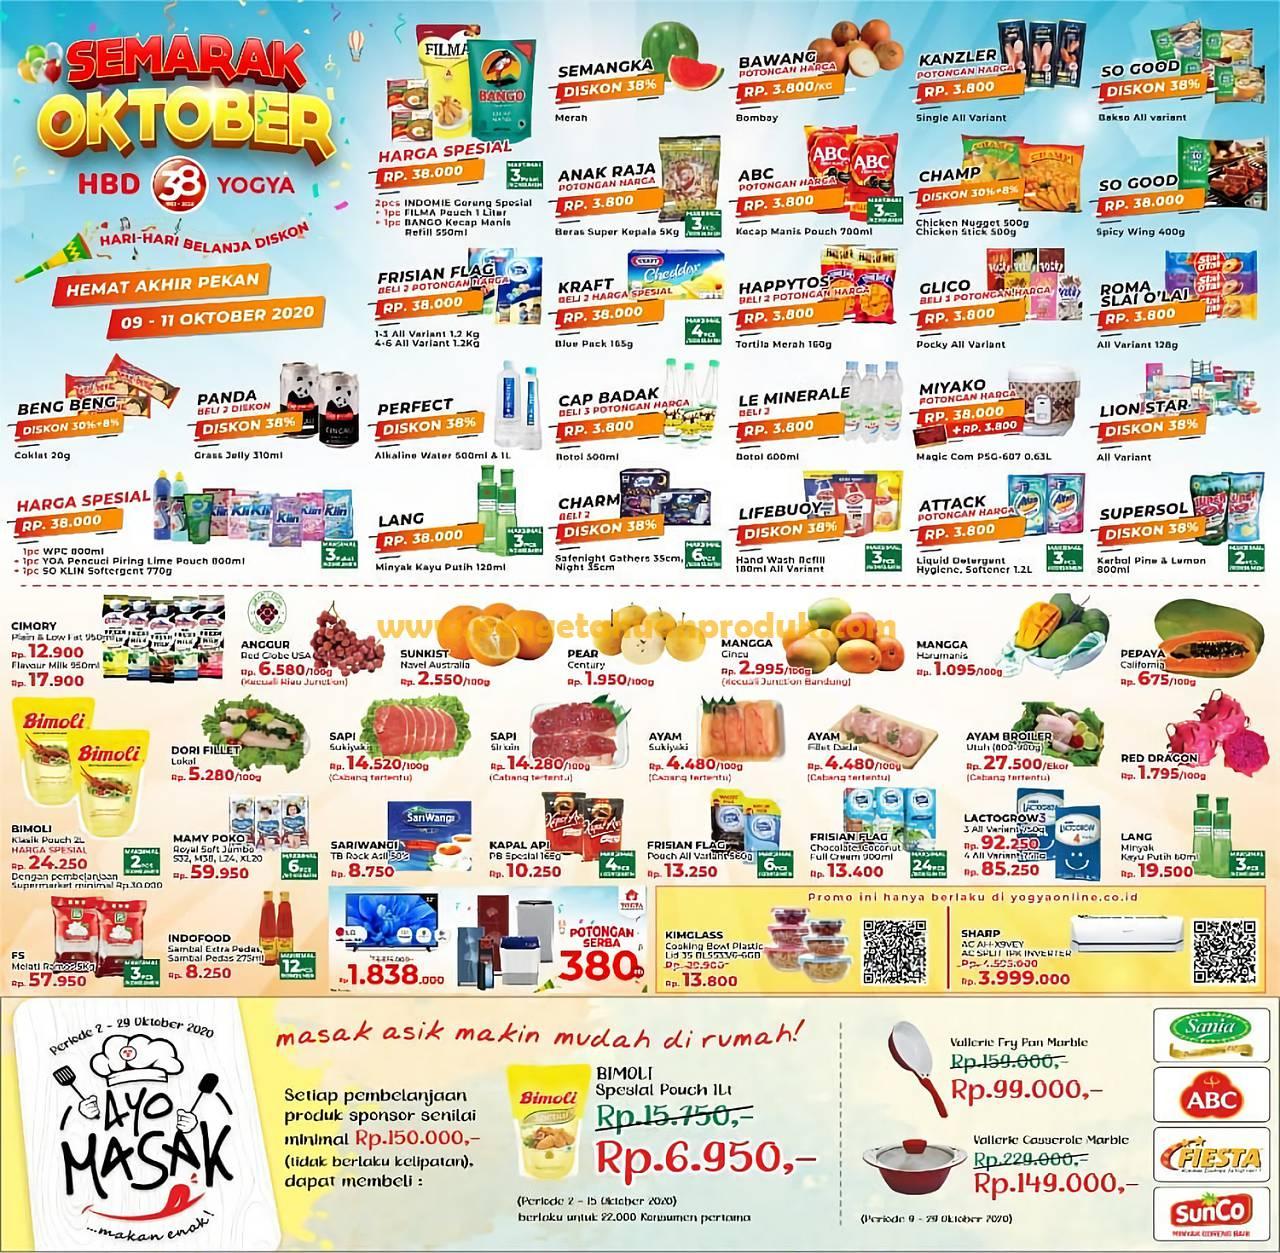 Katalog Promo Toserba Yogya Weekend Periode 9 - 11 Oktober